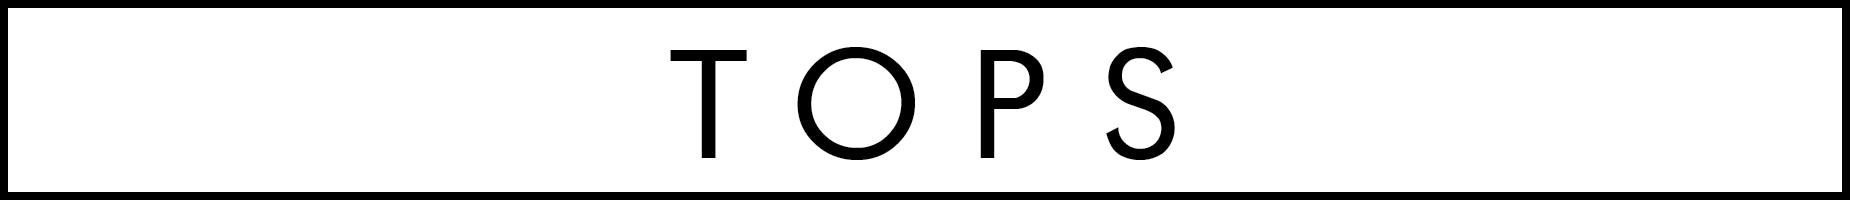 Headers_tops